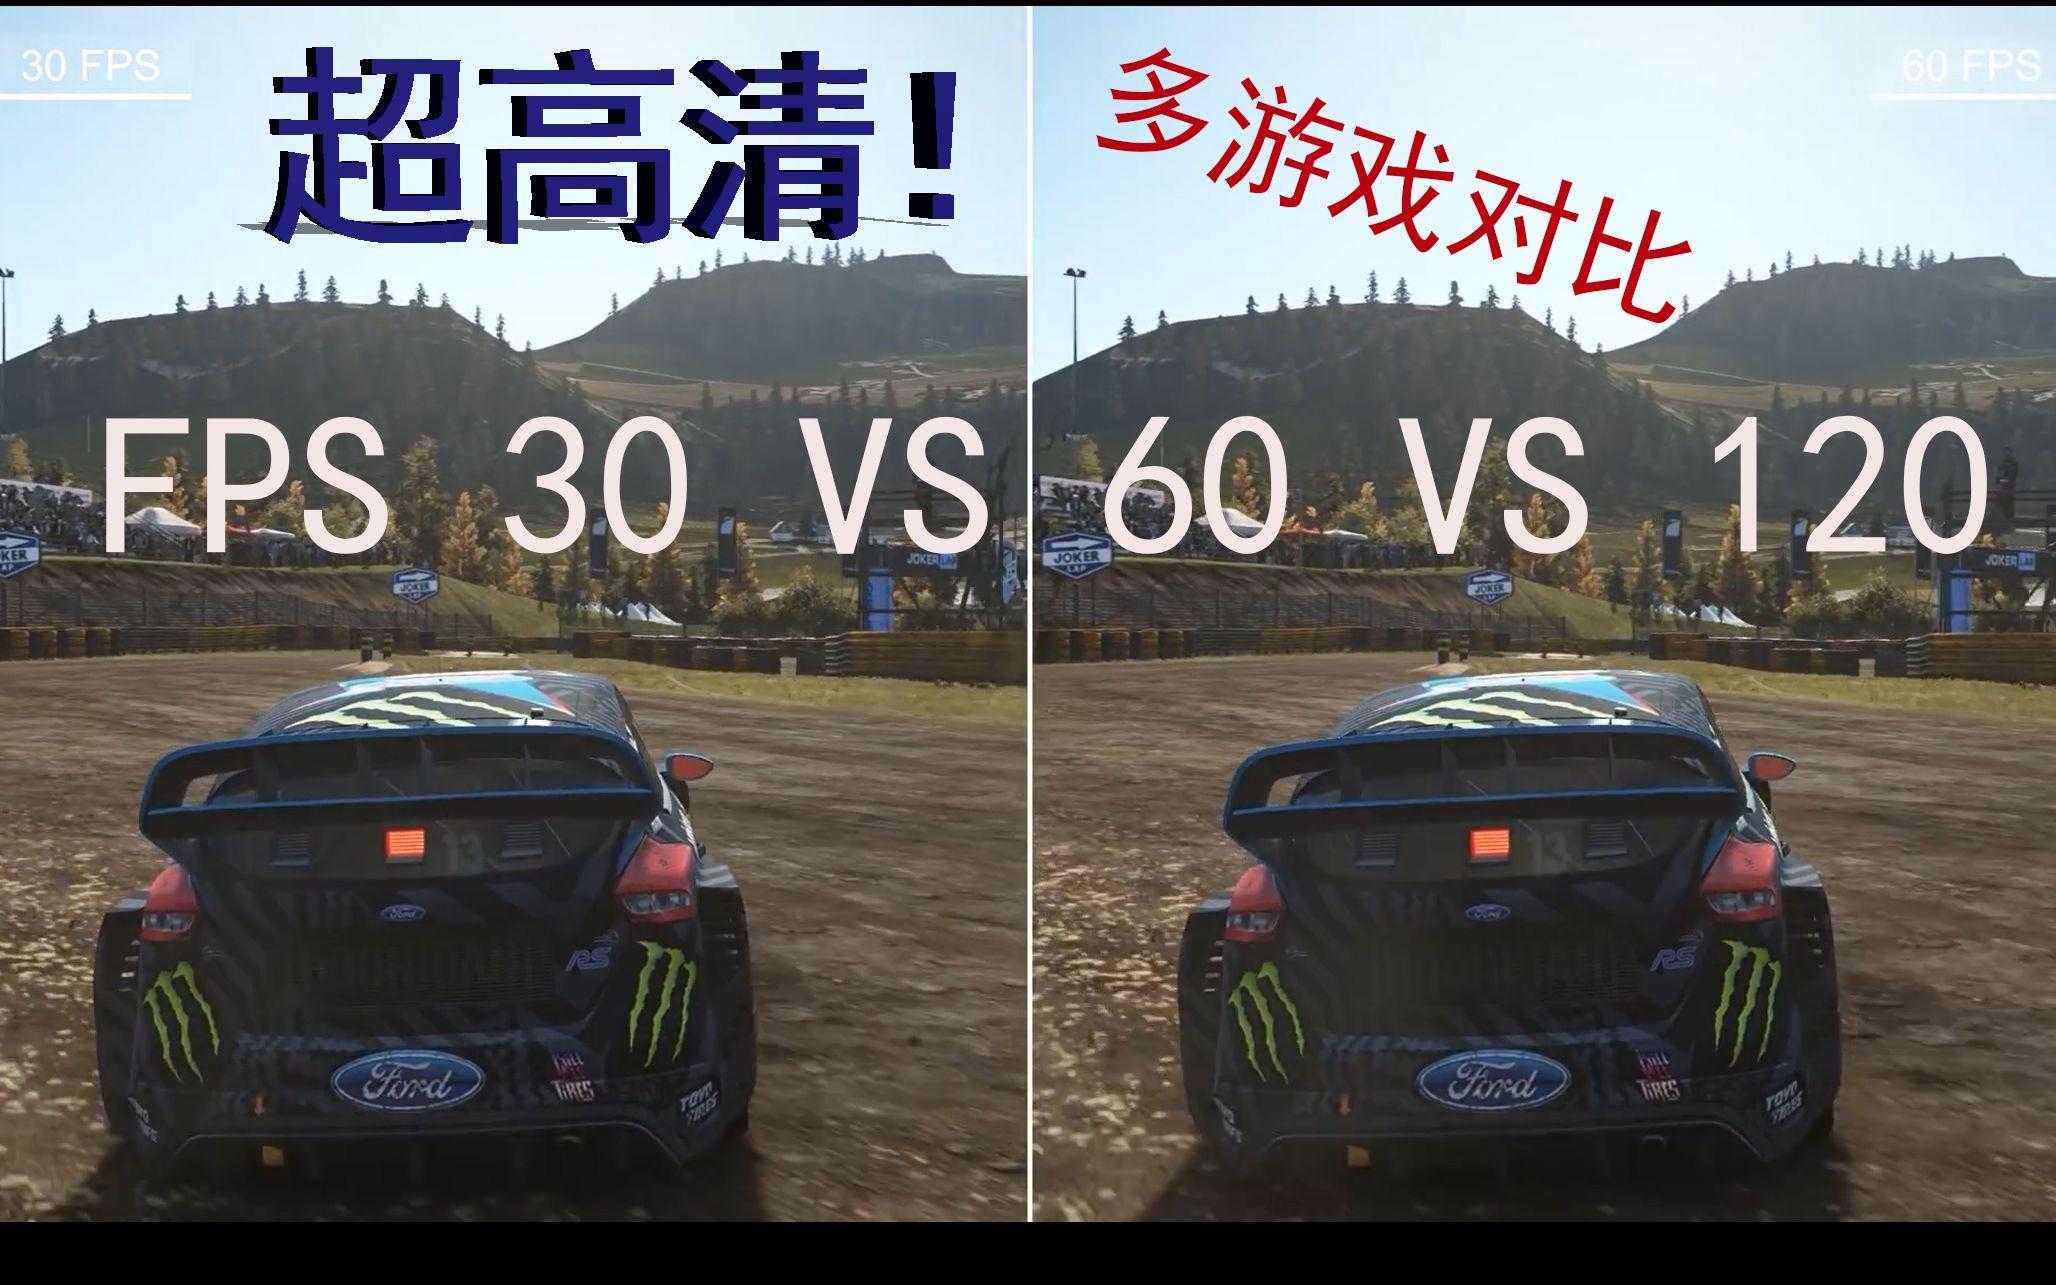 【1080P】多游戏帧数展示对比 30 FPS vs  60 FPS vs  120 FPS_哔哩哔哩 (゜-゜)つロ 干杯~-bilibili